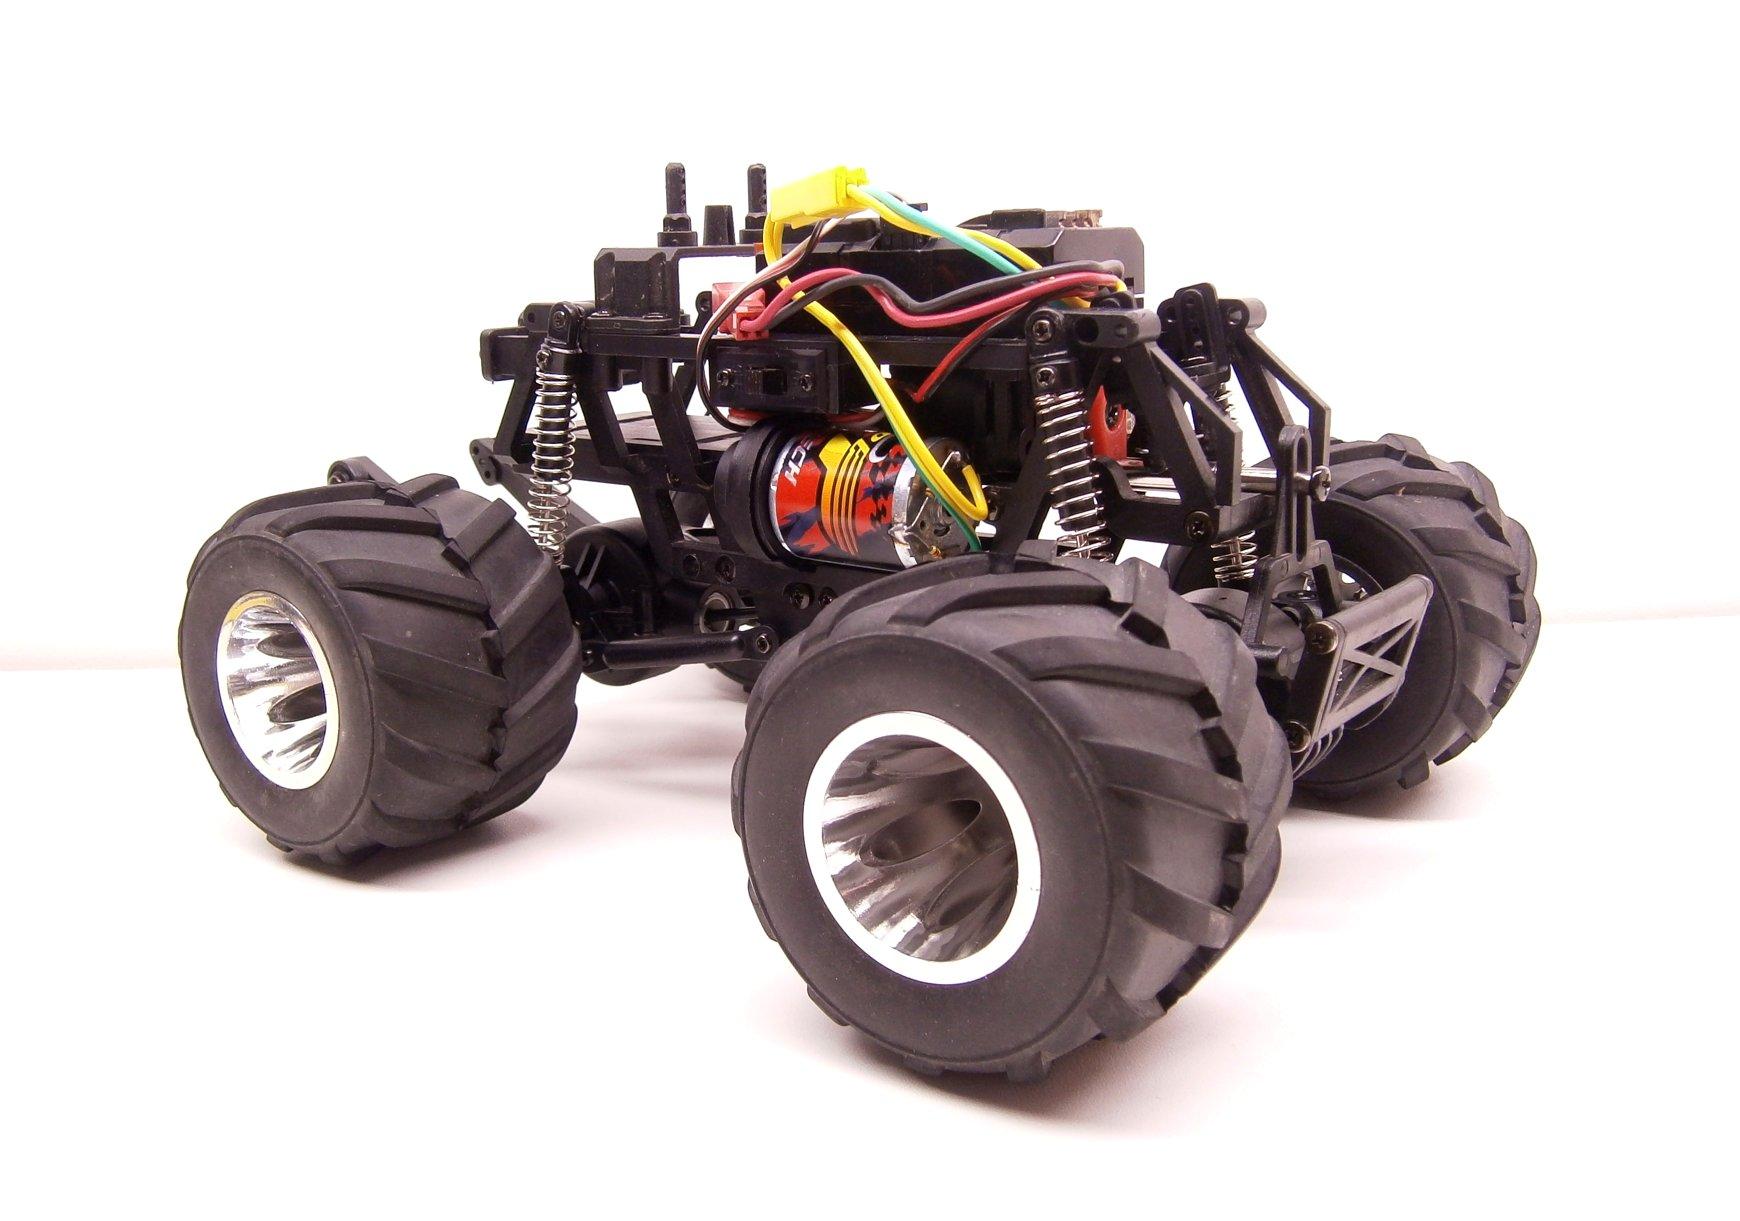 Review A-Tech Leo-X aka Mini Giant aka Trinity Clash aka Mini Bison 2 aka (d'autres noms peut-être) 538966052